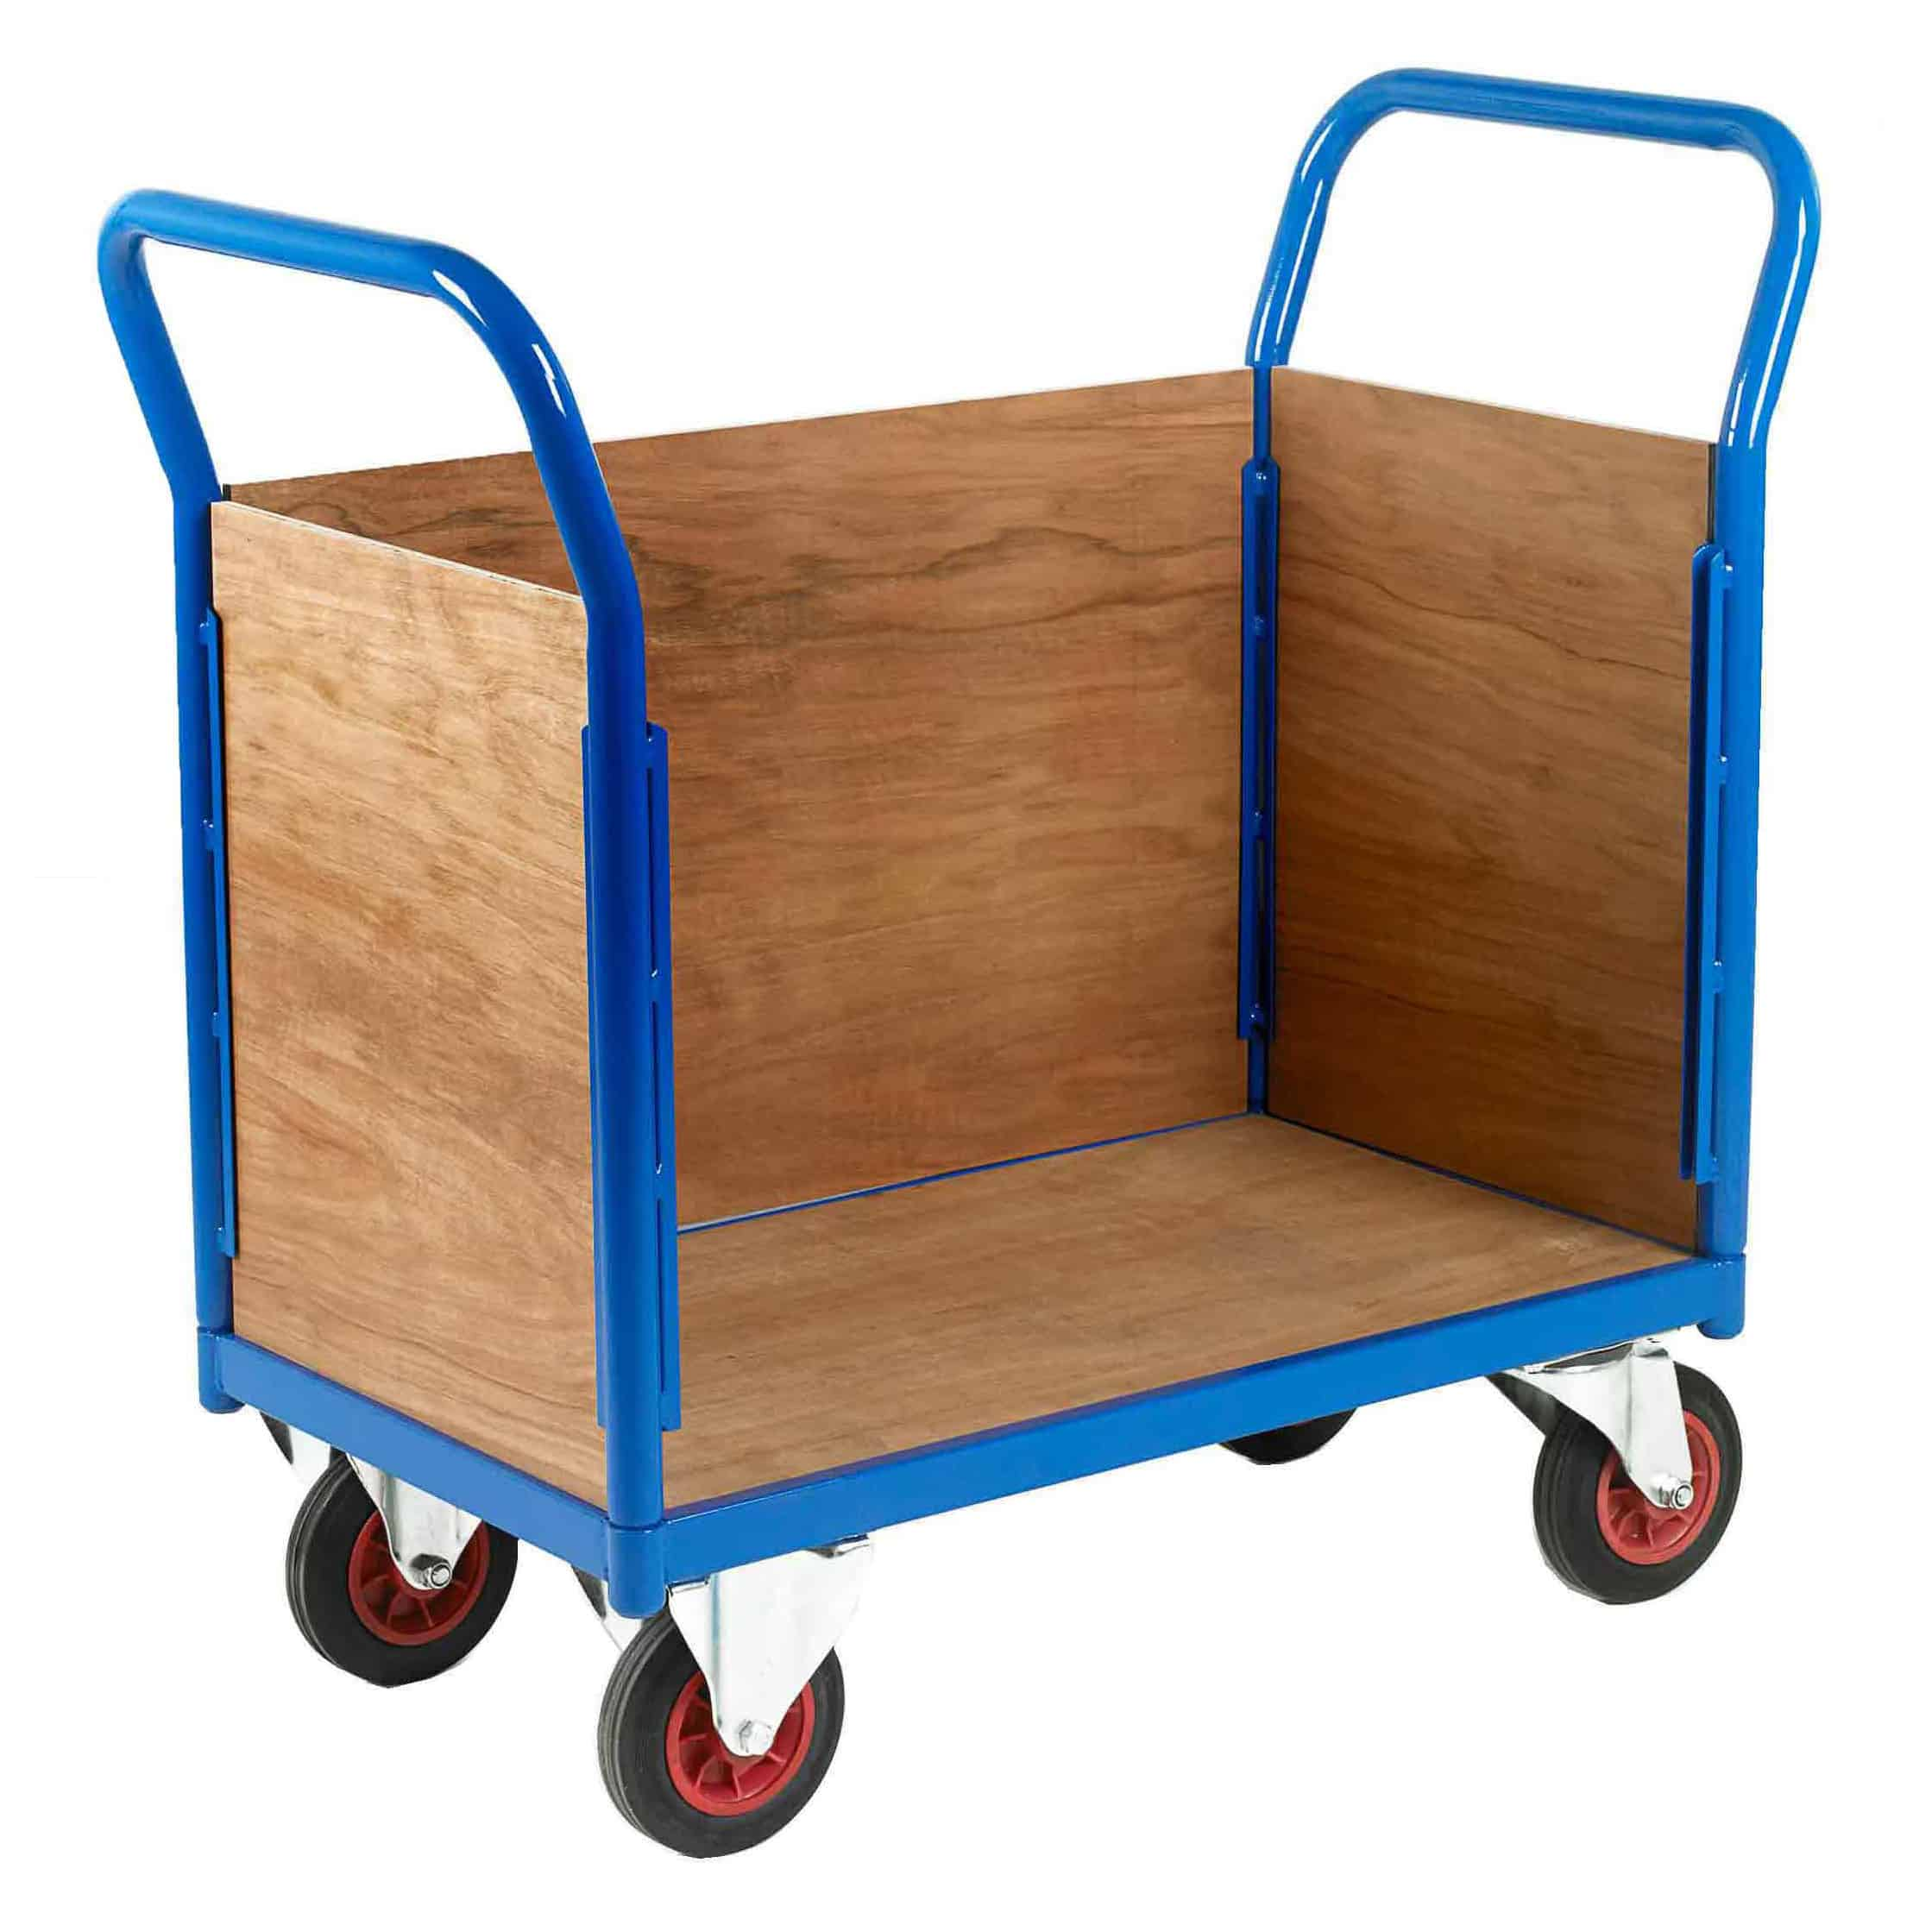 3 Sided Timber Platform Trolleys